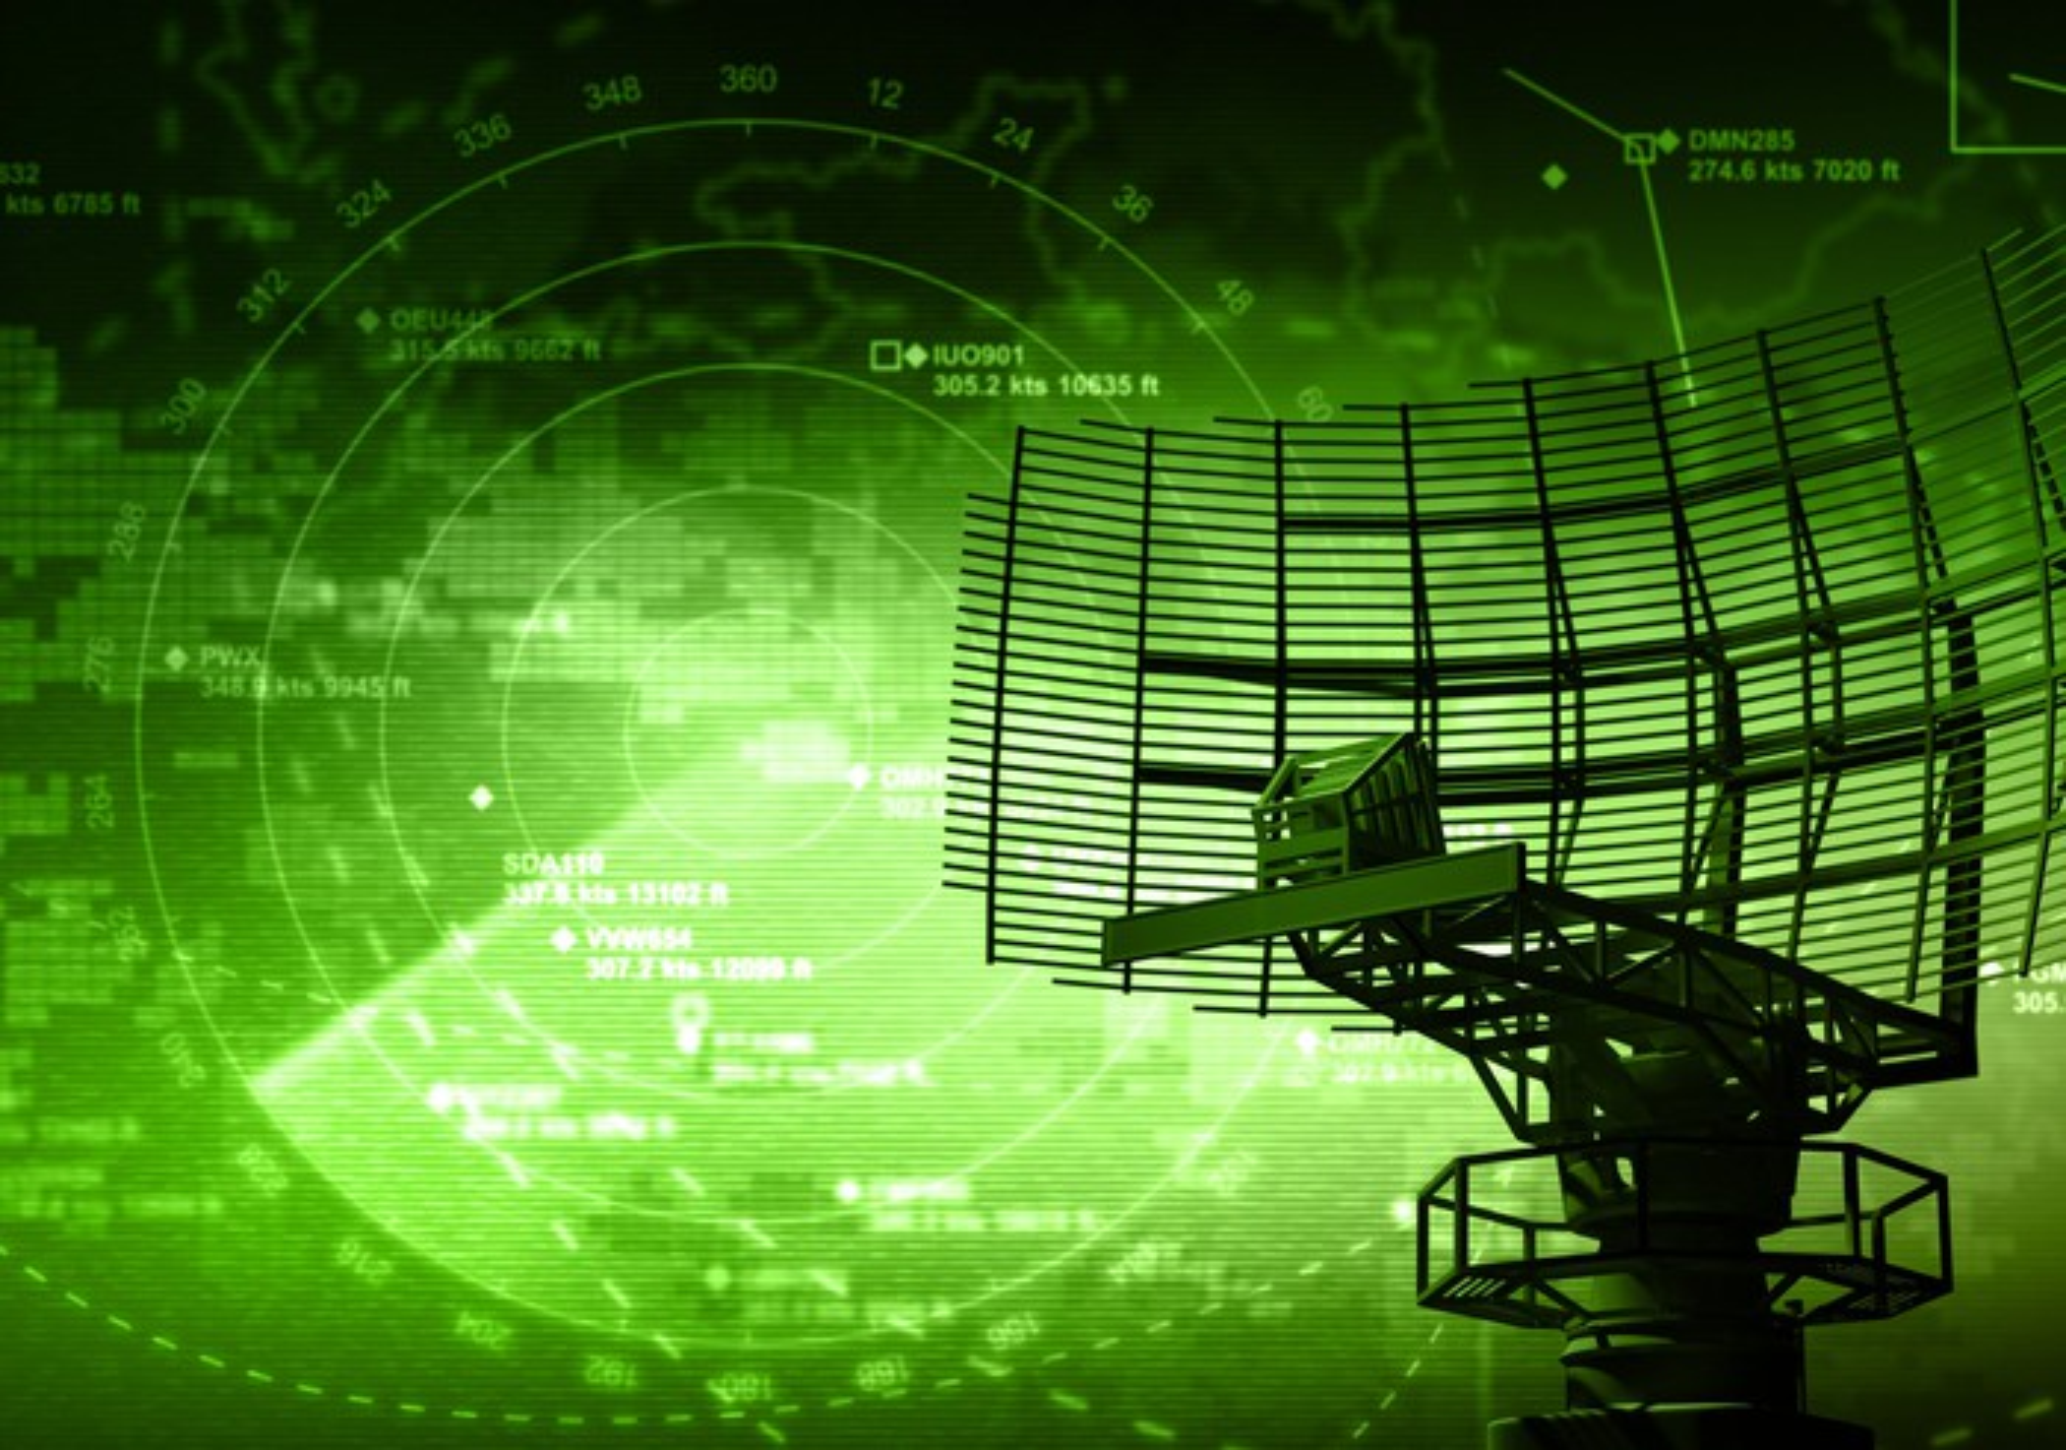 Green radar screen and antenna.